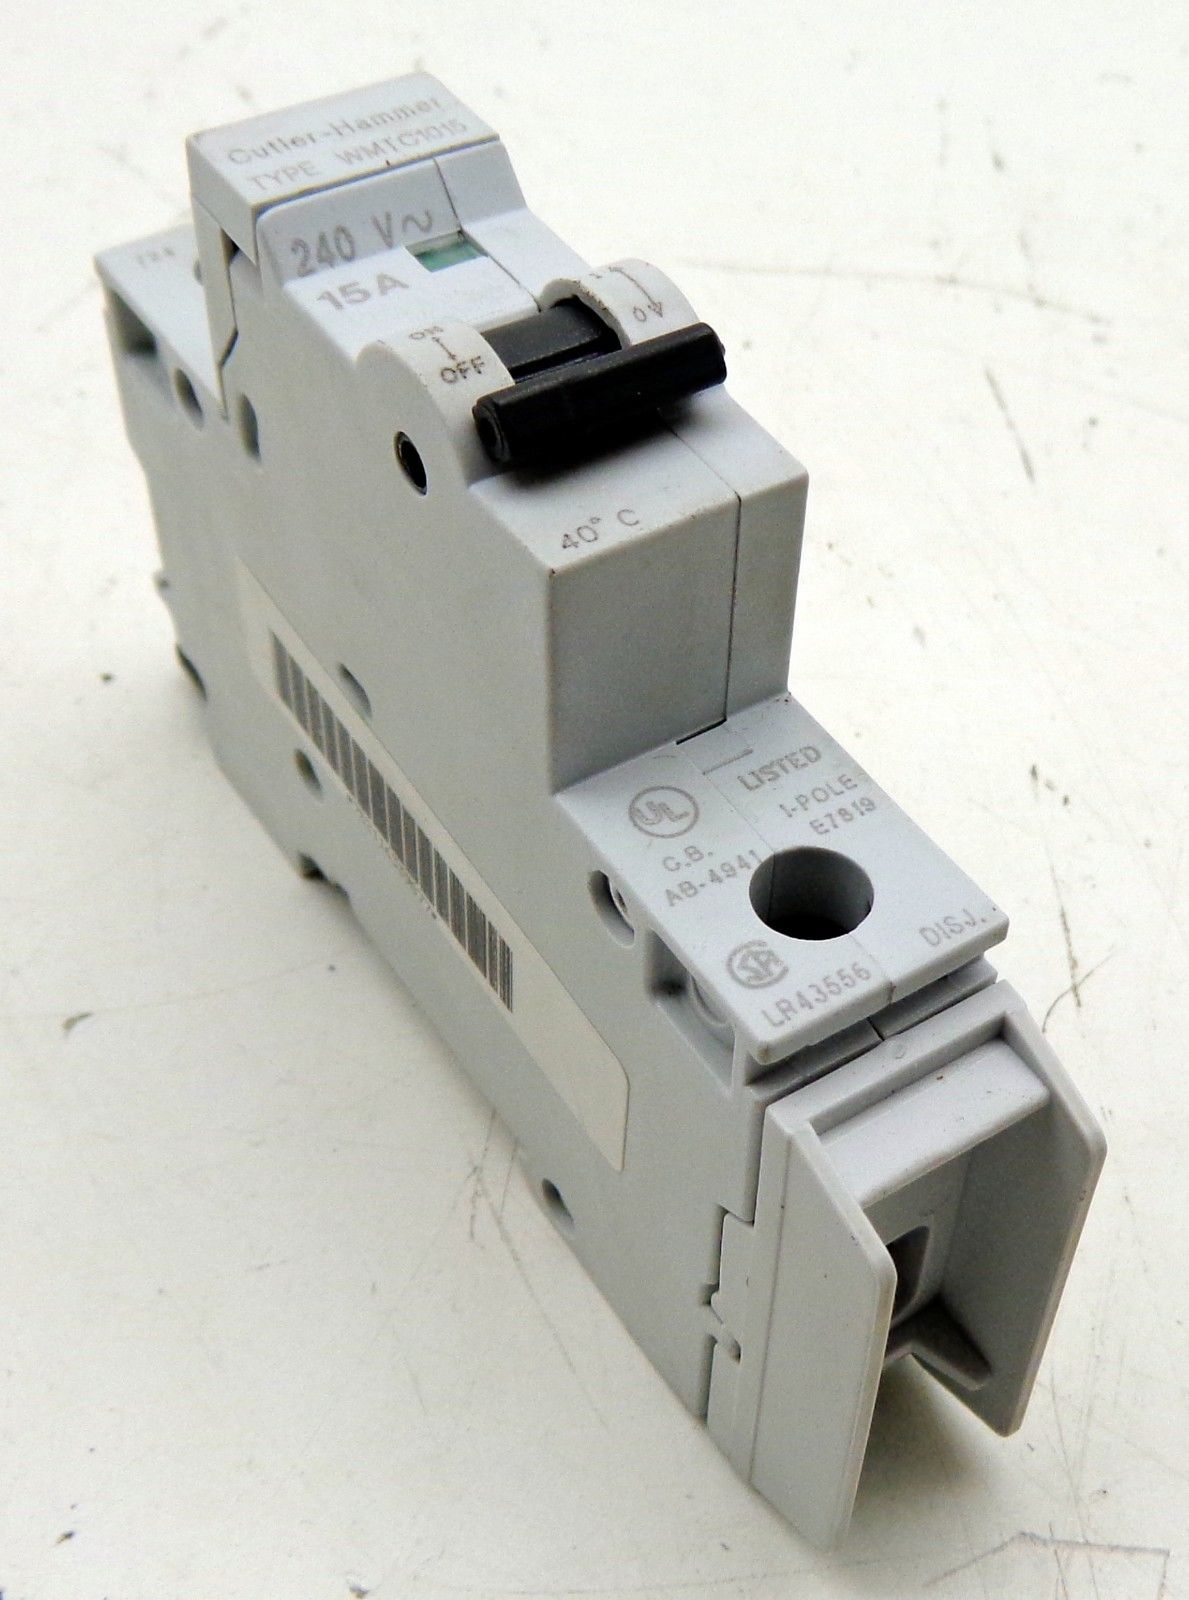 Cutler-Hammer WMTC1015 Circuit Breaker 15A 240V